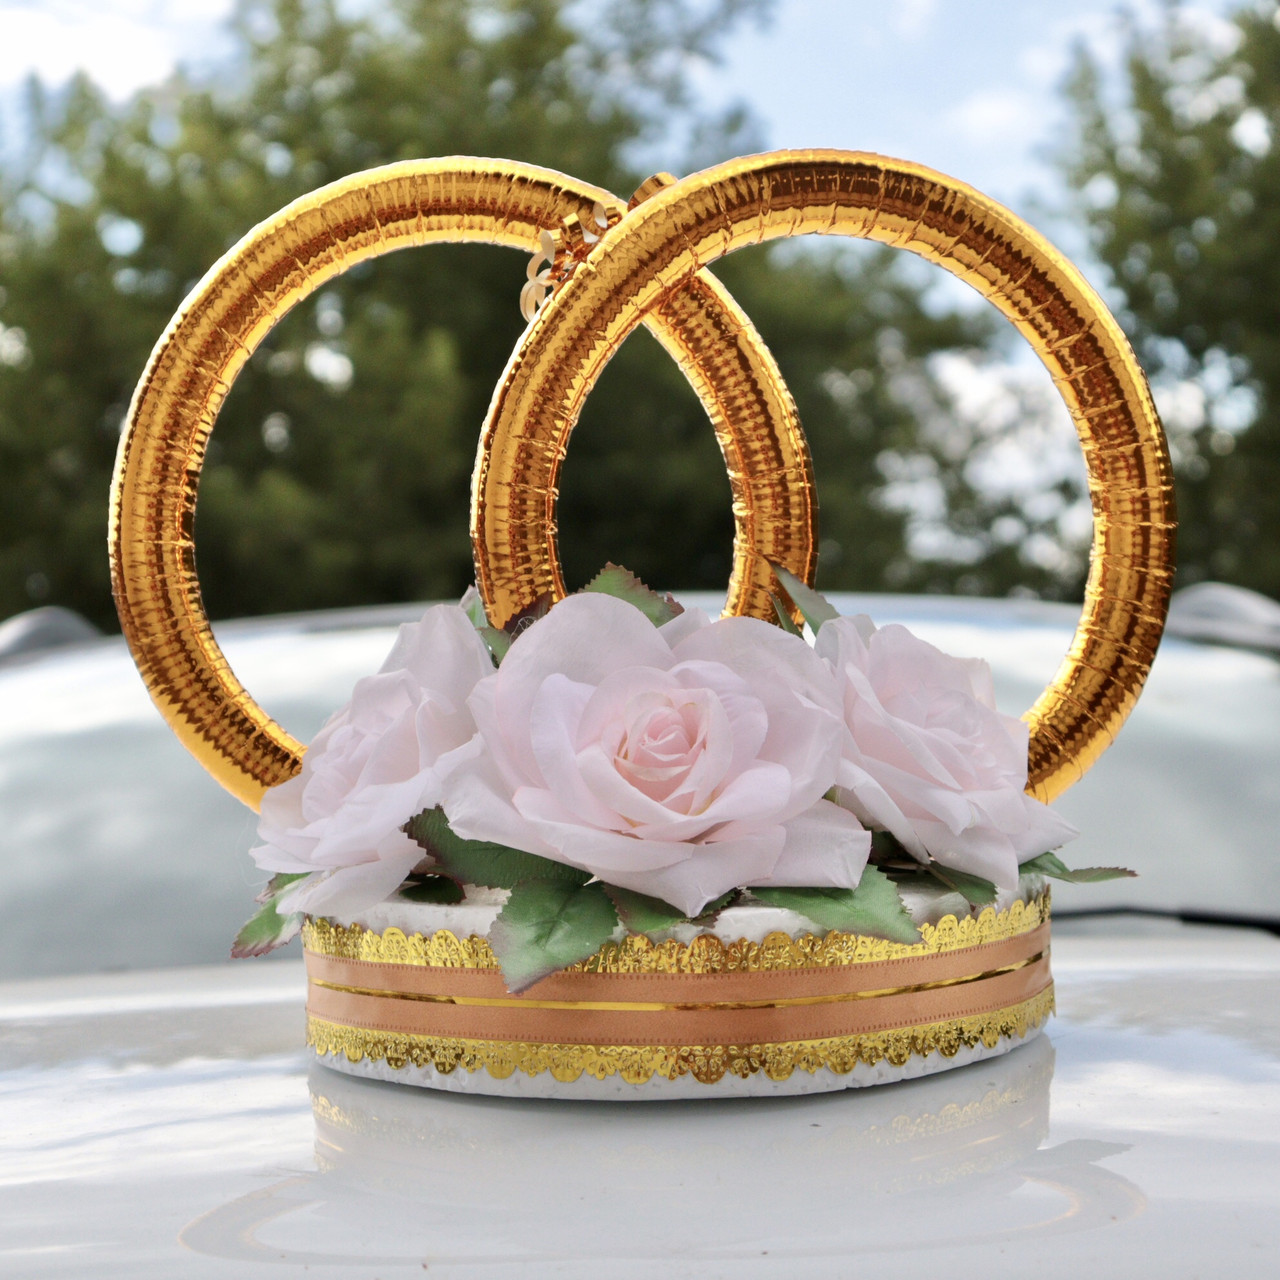 Пенопласт! Свадебные Кольца на автомобиль 34х26х16 см на магнитах, Розовые цветы